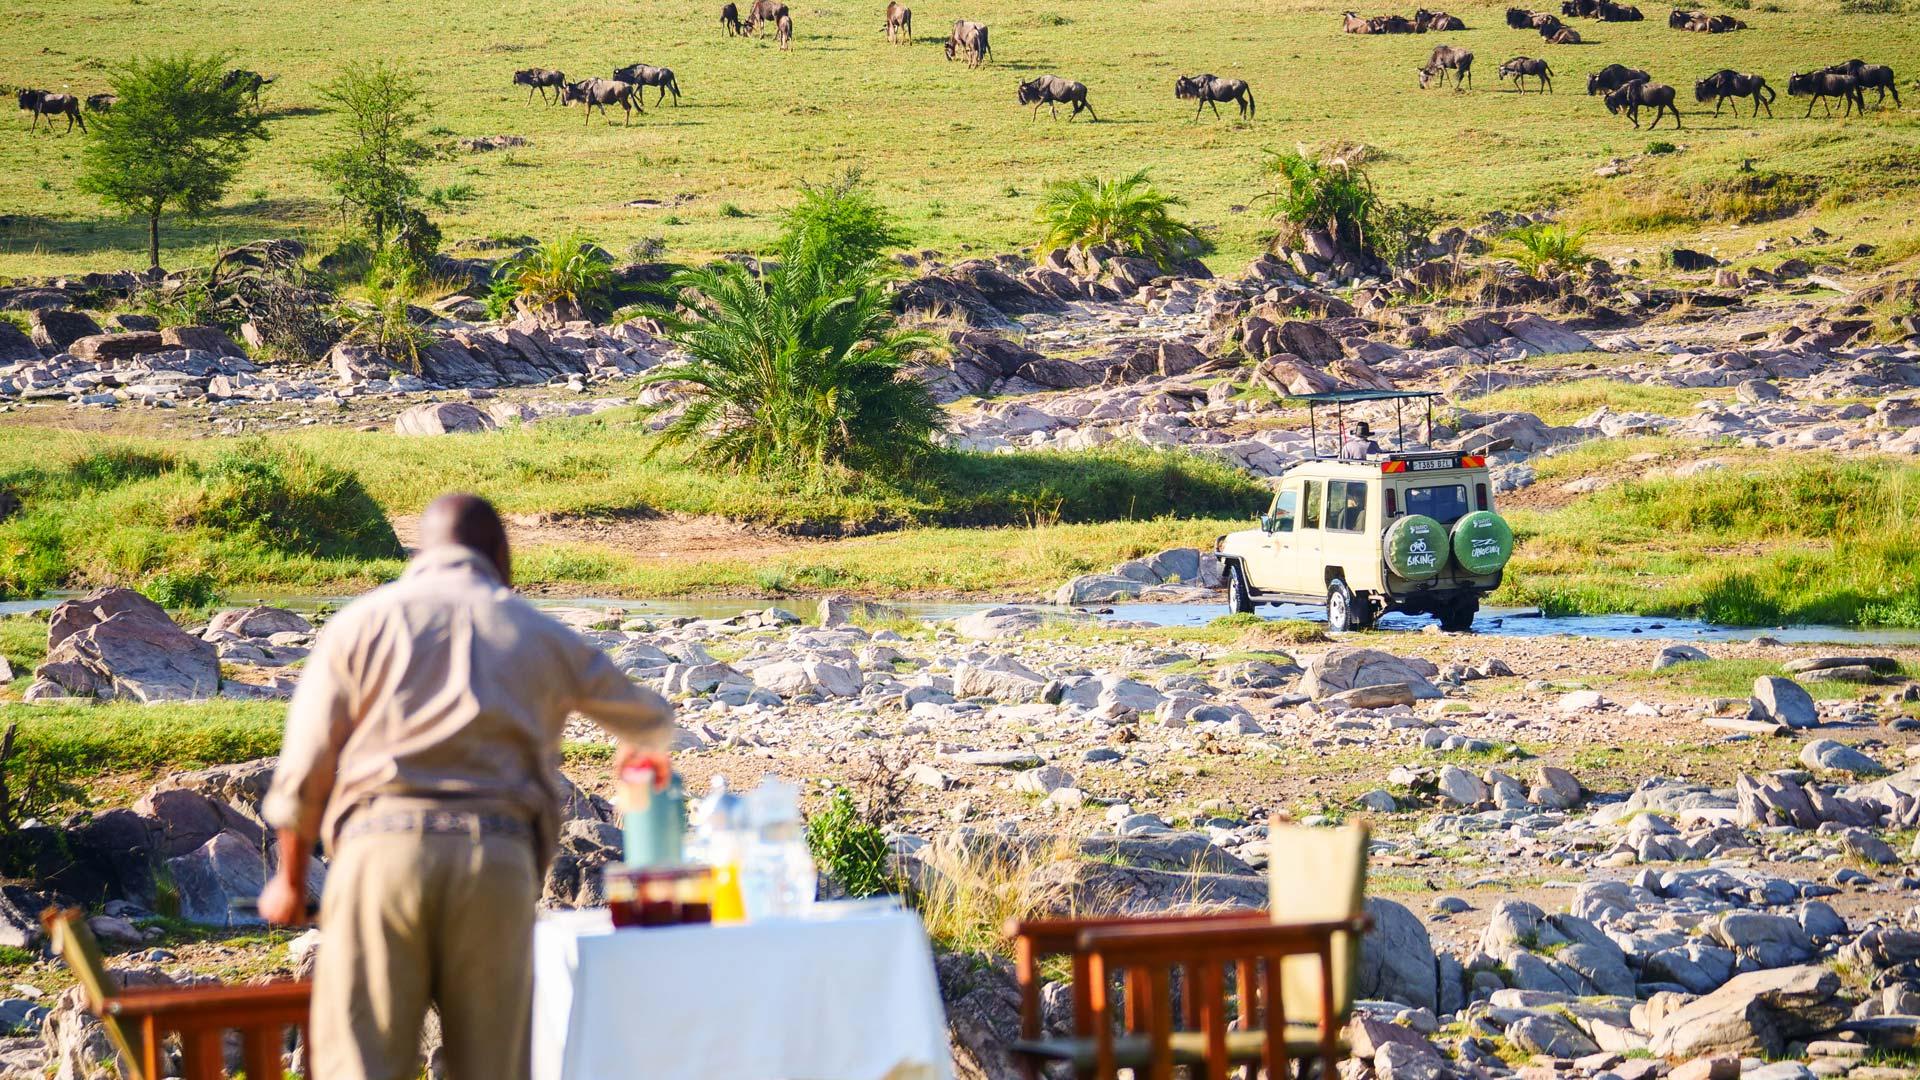 Open air breakfast with Wildebeest